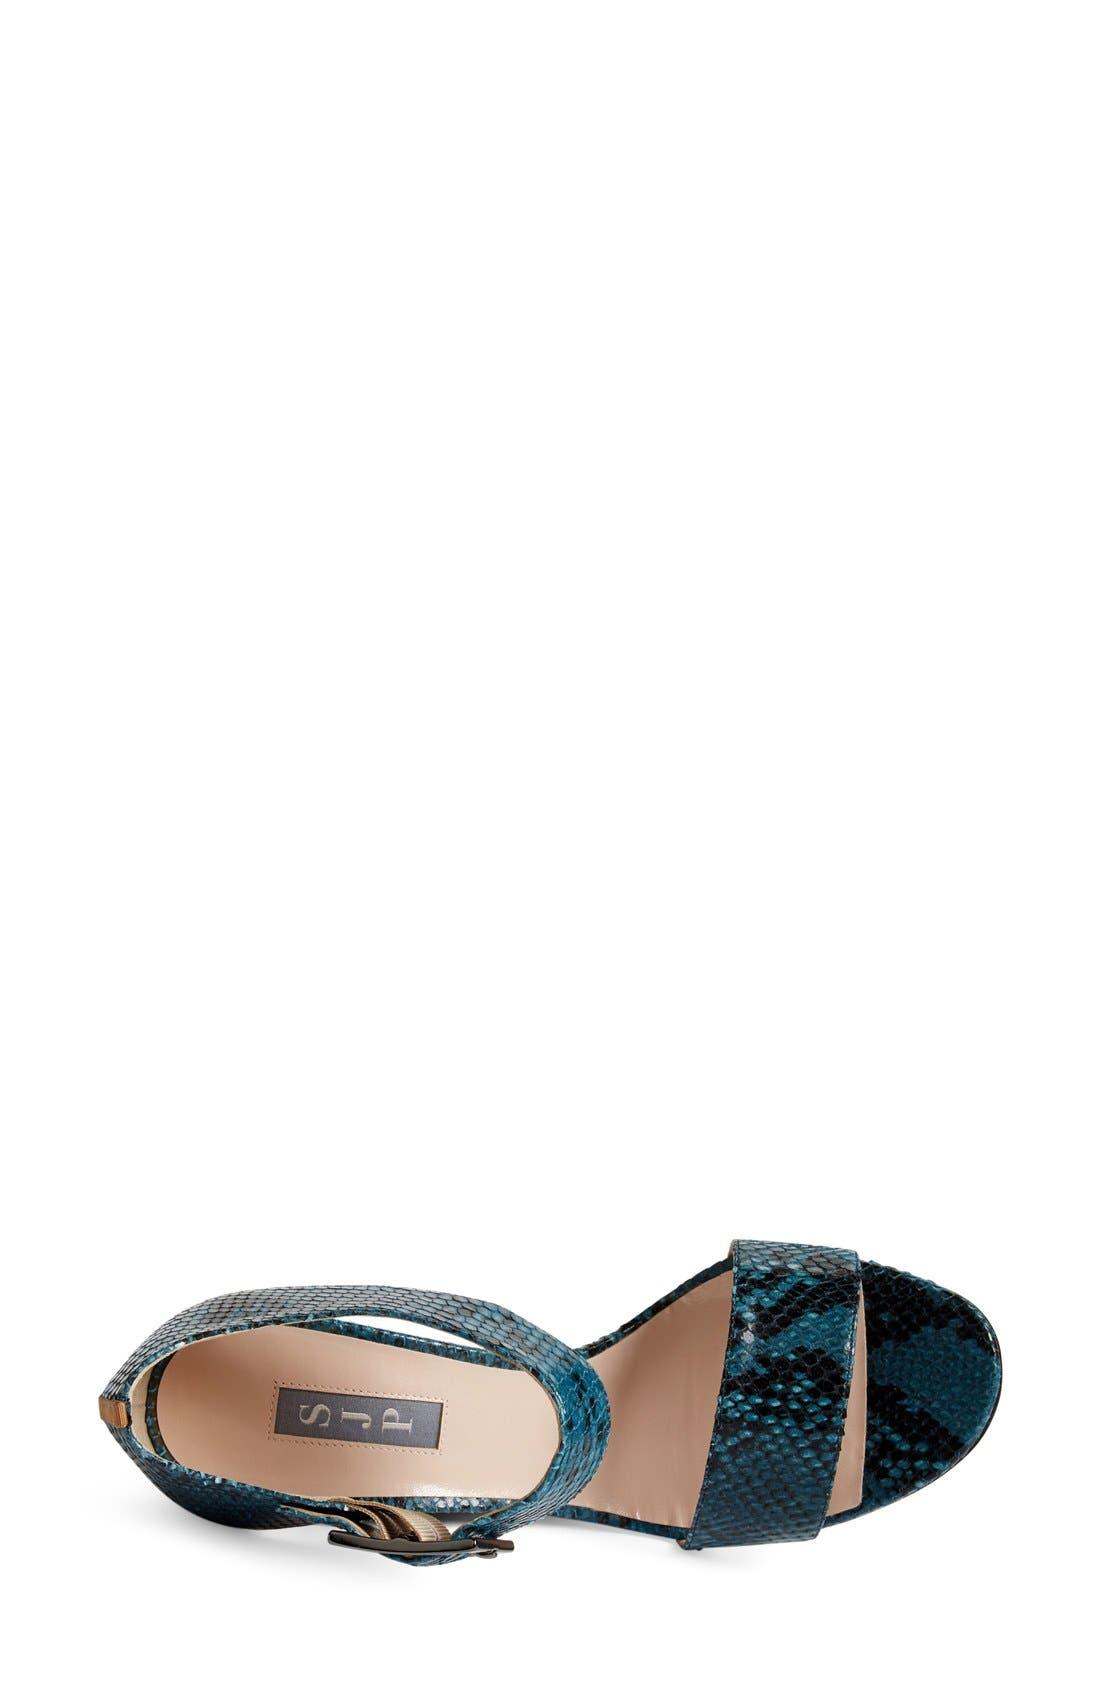 Alternate Image 3  - SJP by Sarah Jessica Parker 'Tate' Wedge Sandal (Women)